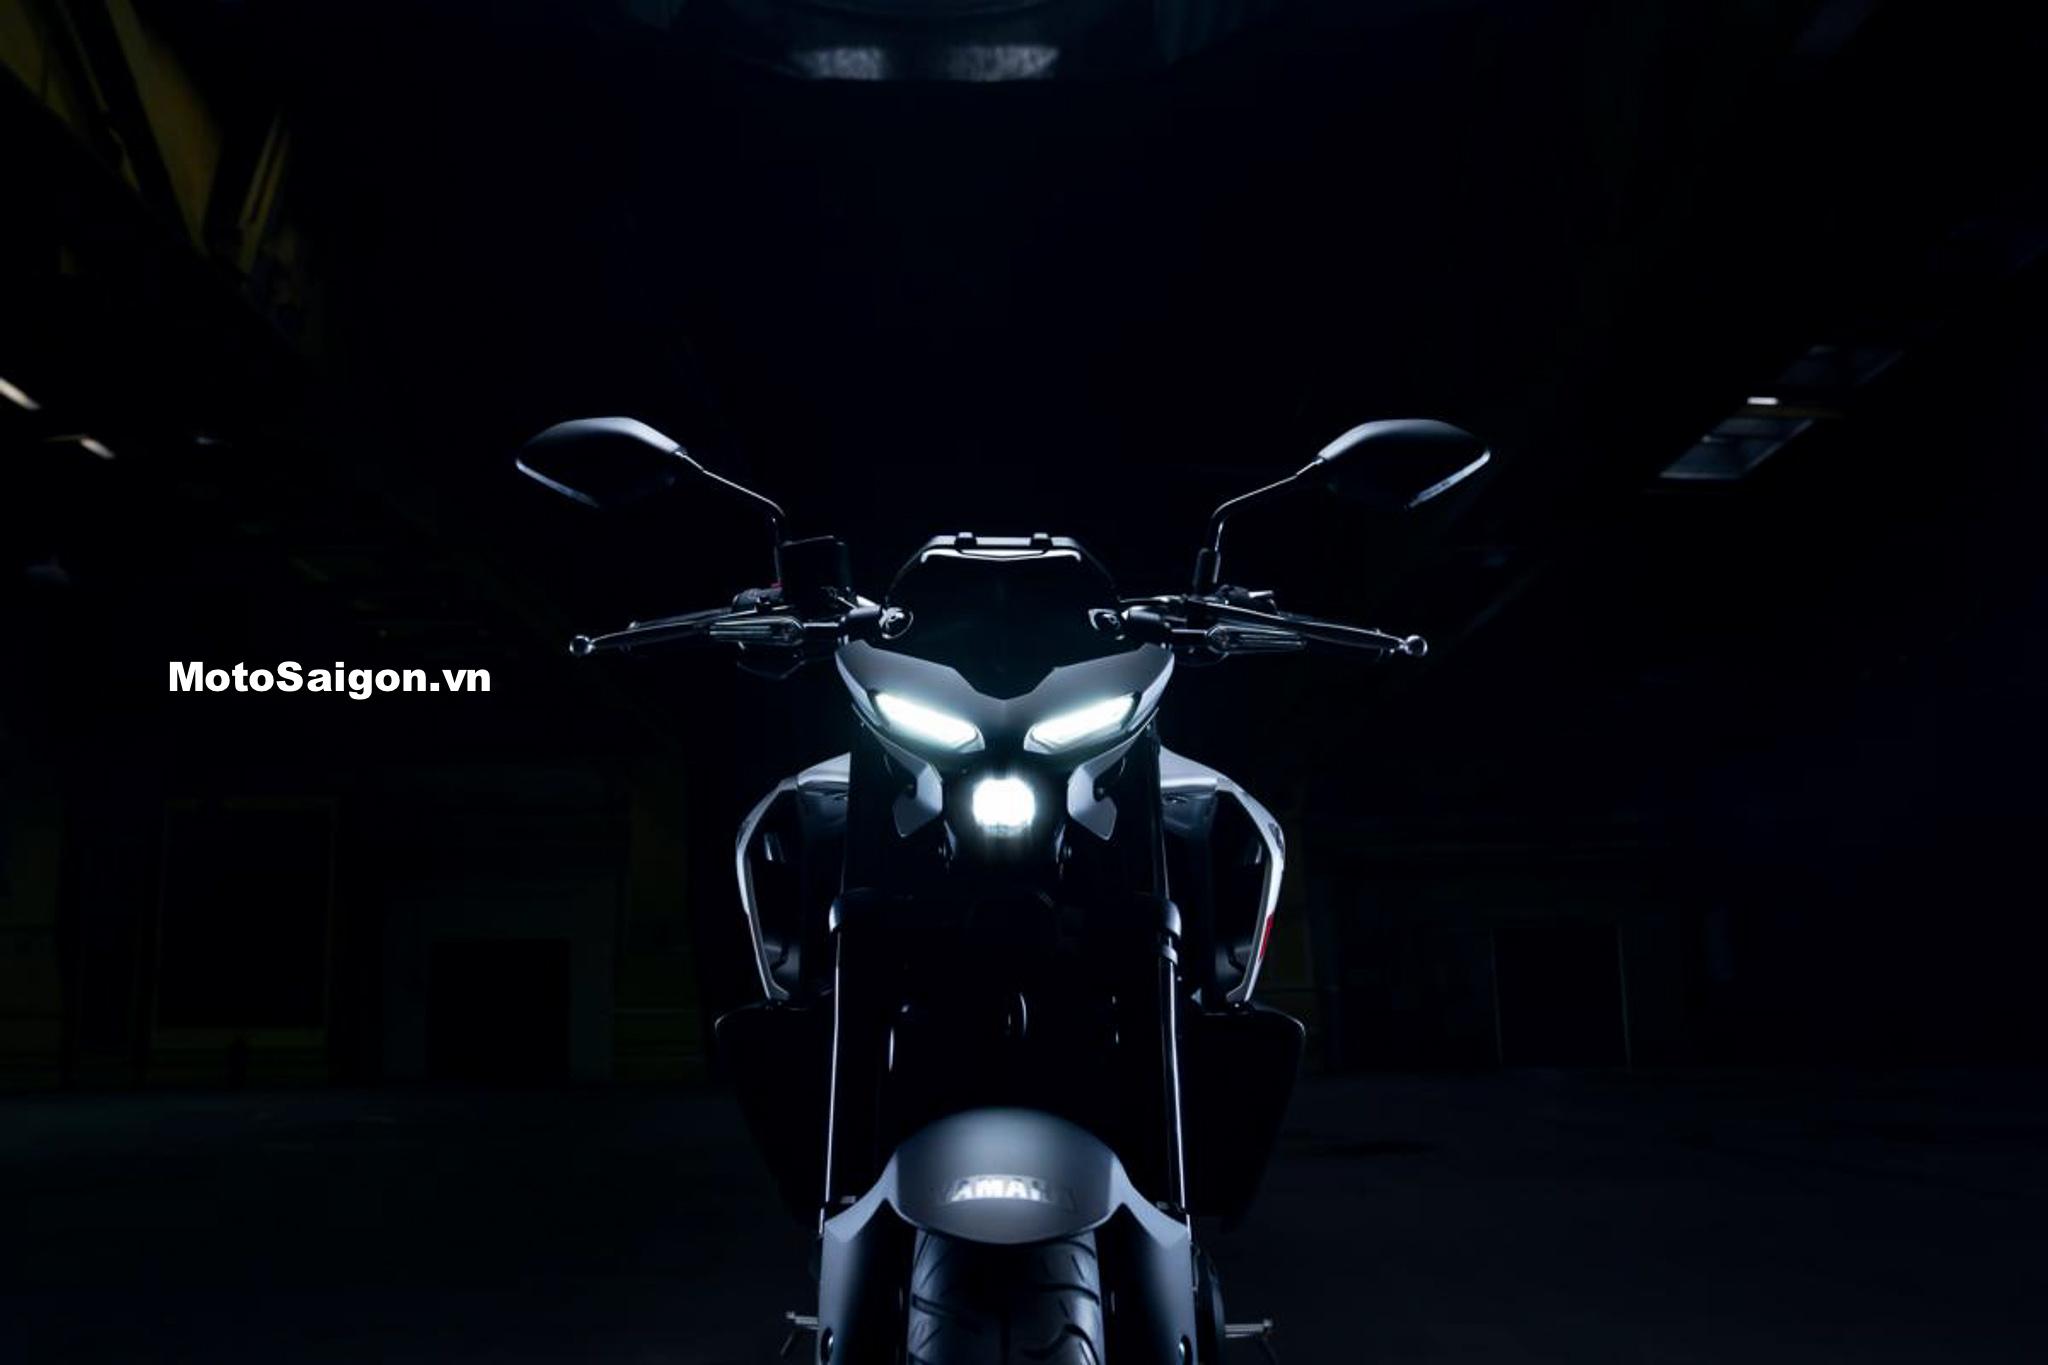 yamaha mt 03 abs 2020 danh gia xe motosaigon 20